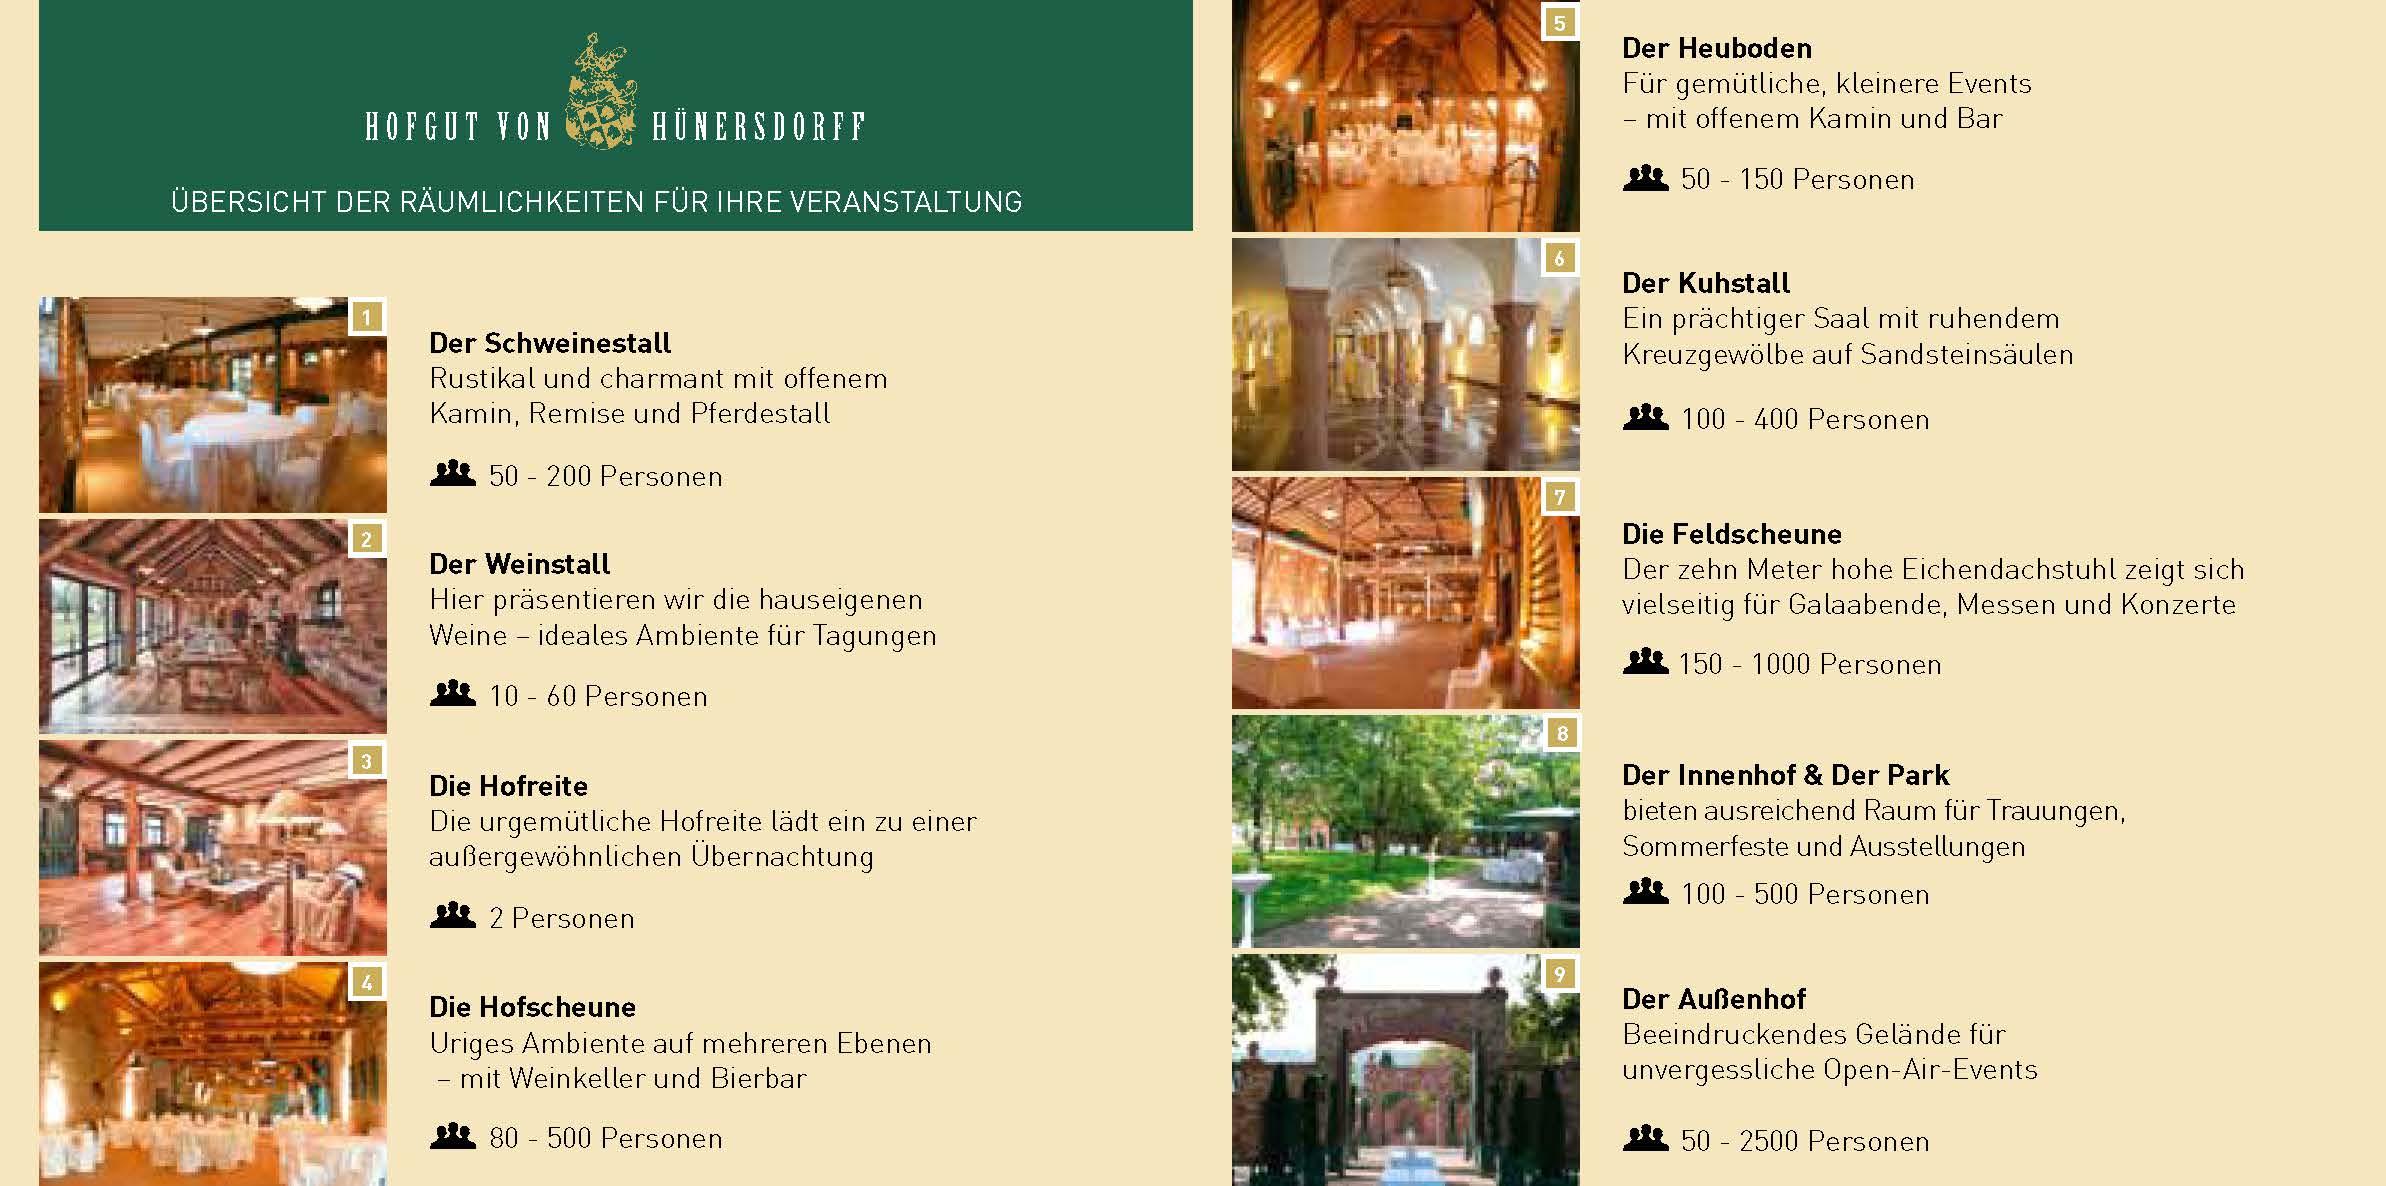 HofgutHuenersdorff_Broschuere_neu2015_Seite_10